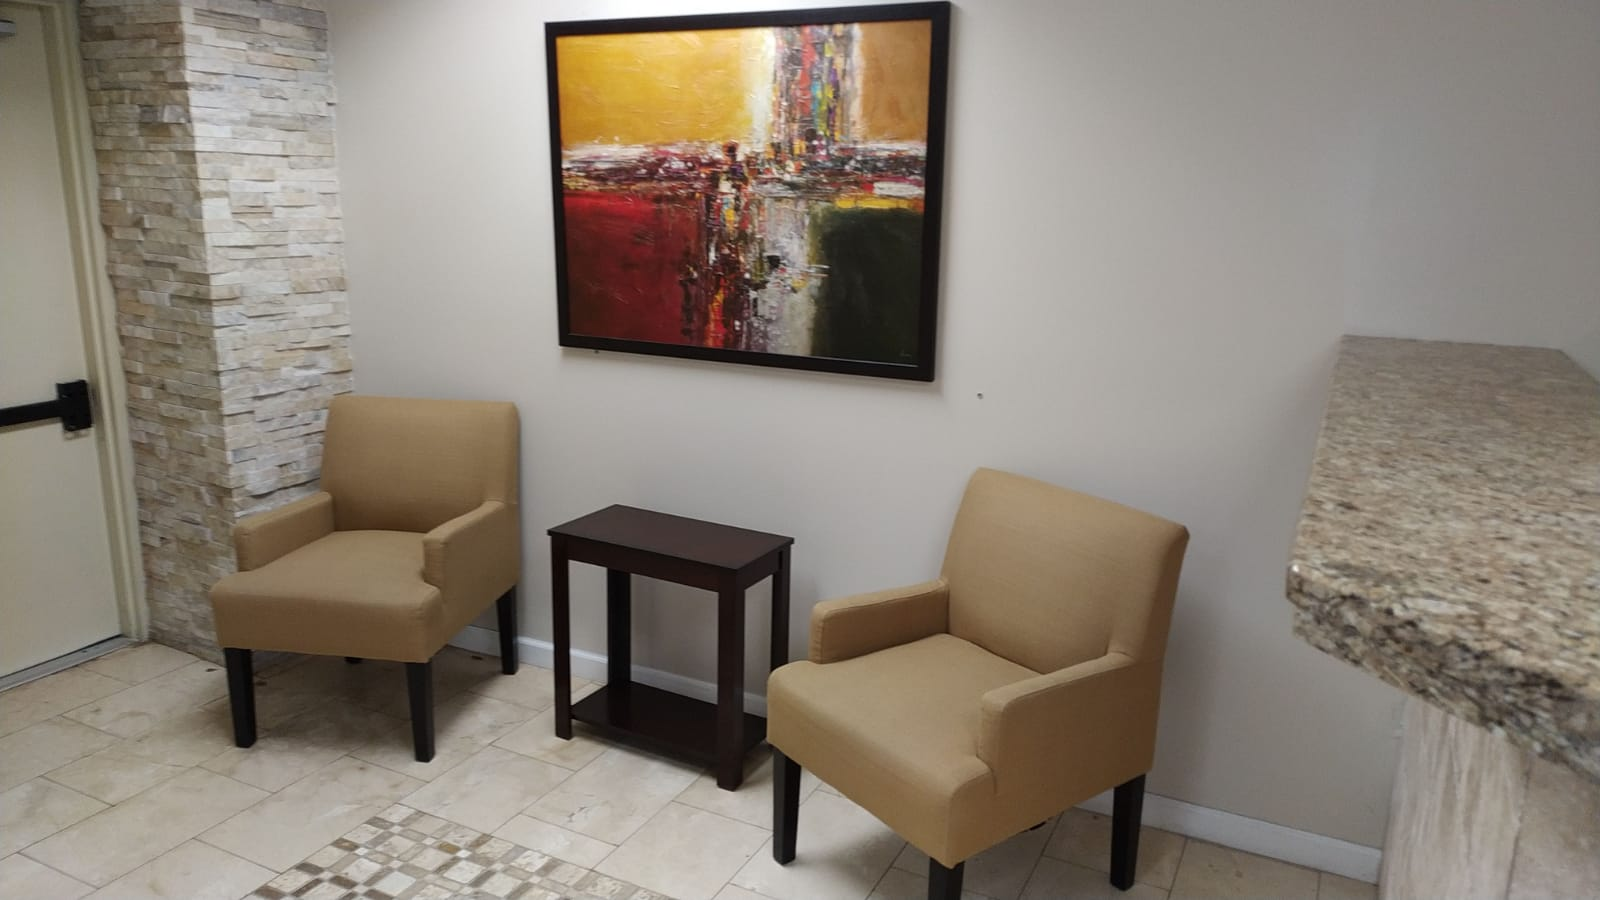 up-office-image-4jpg.jpg